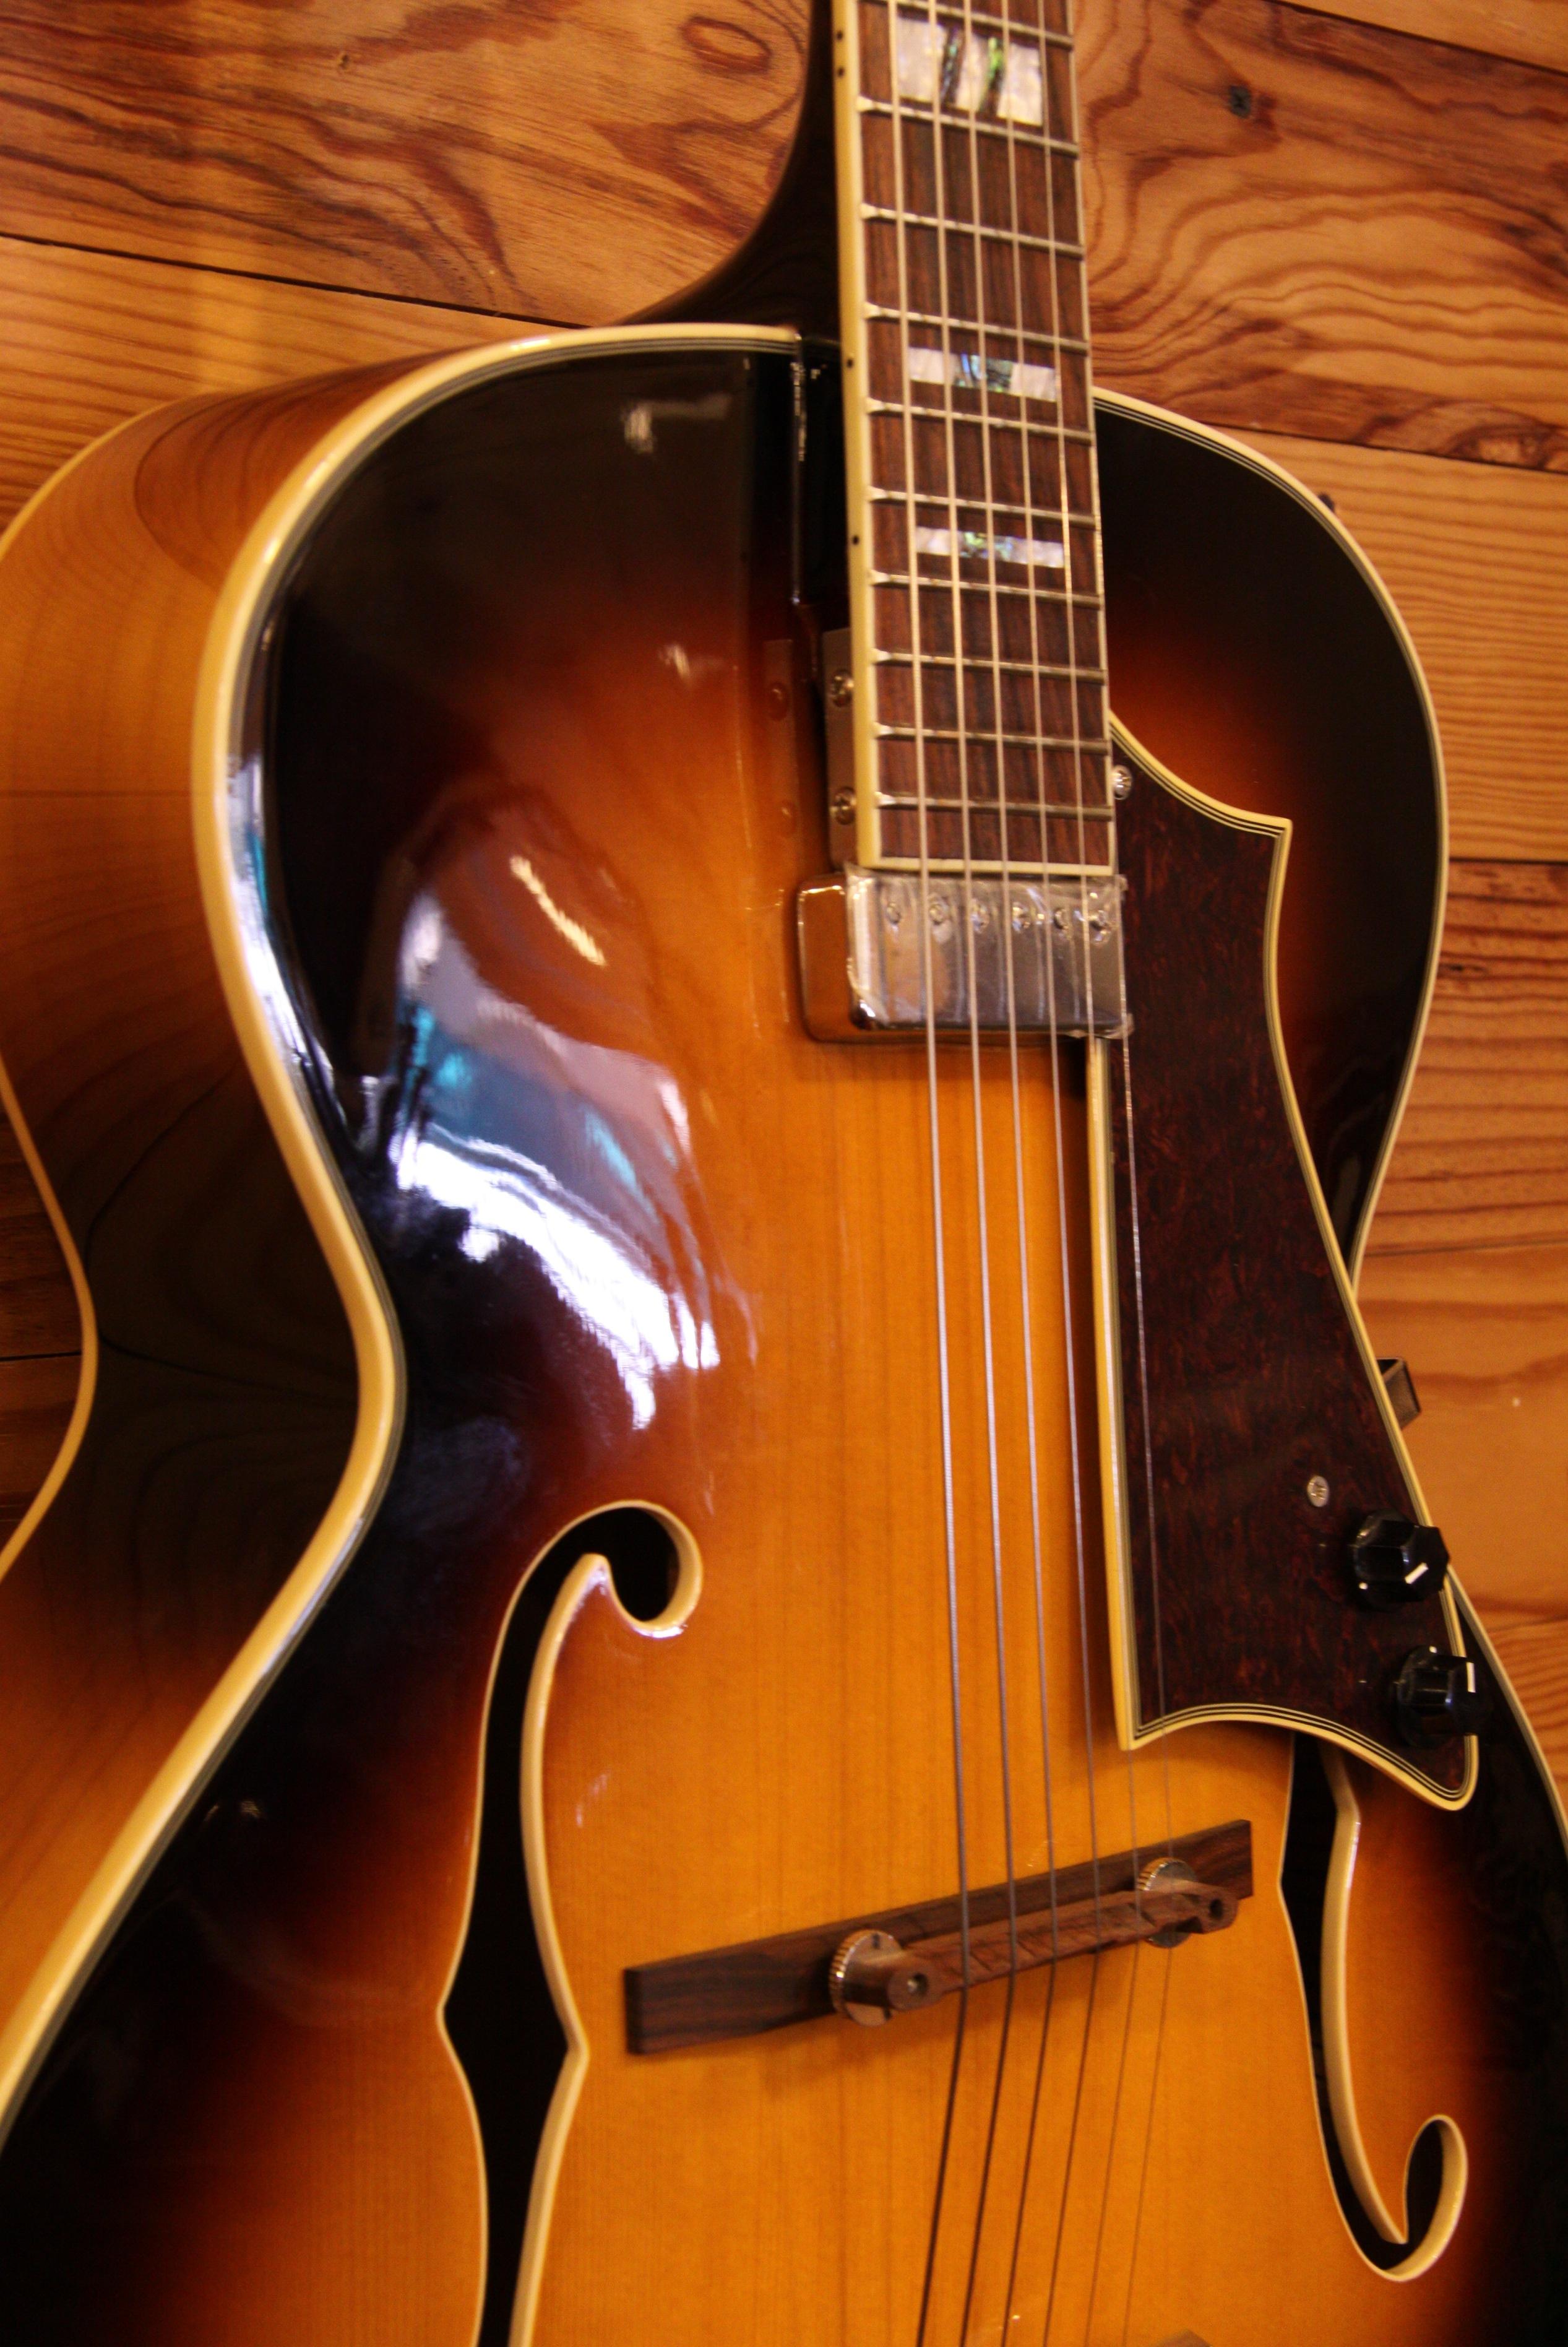 guitares peerless rockshop magasin de guitares montpellier magasin de musique. Black Bedroom Furniture Sets. Home Design Ideas